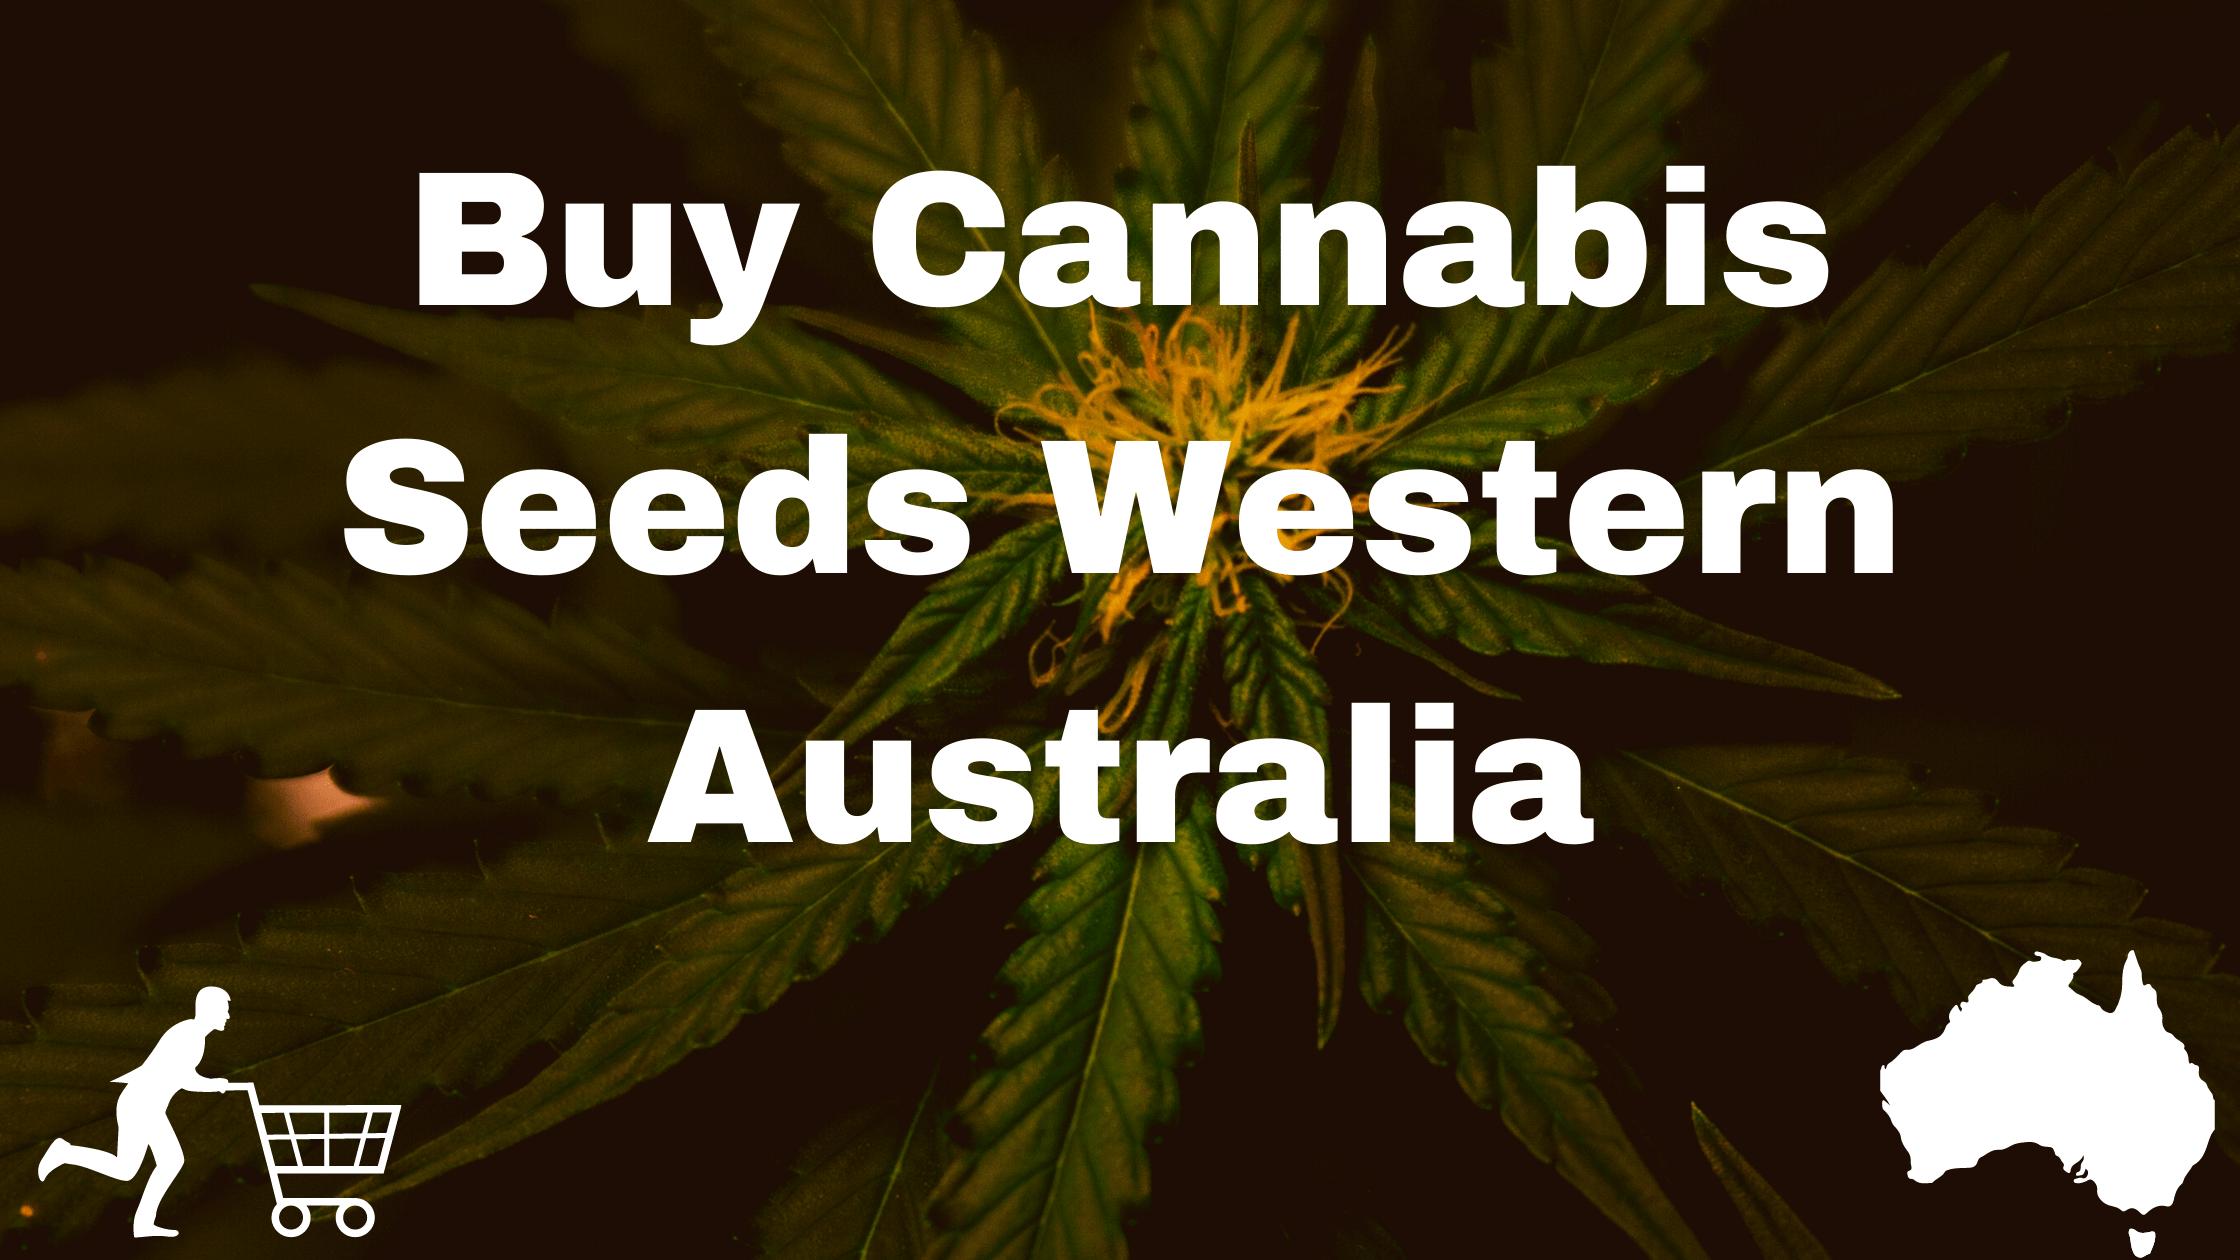 Buy Cannabis Seeds Western Australia Banner